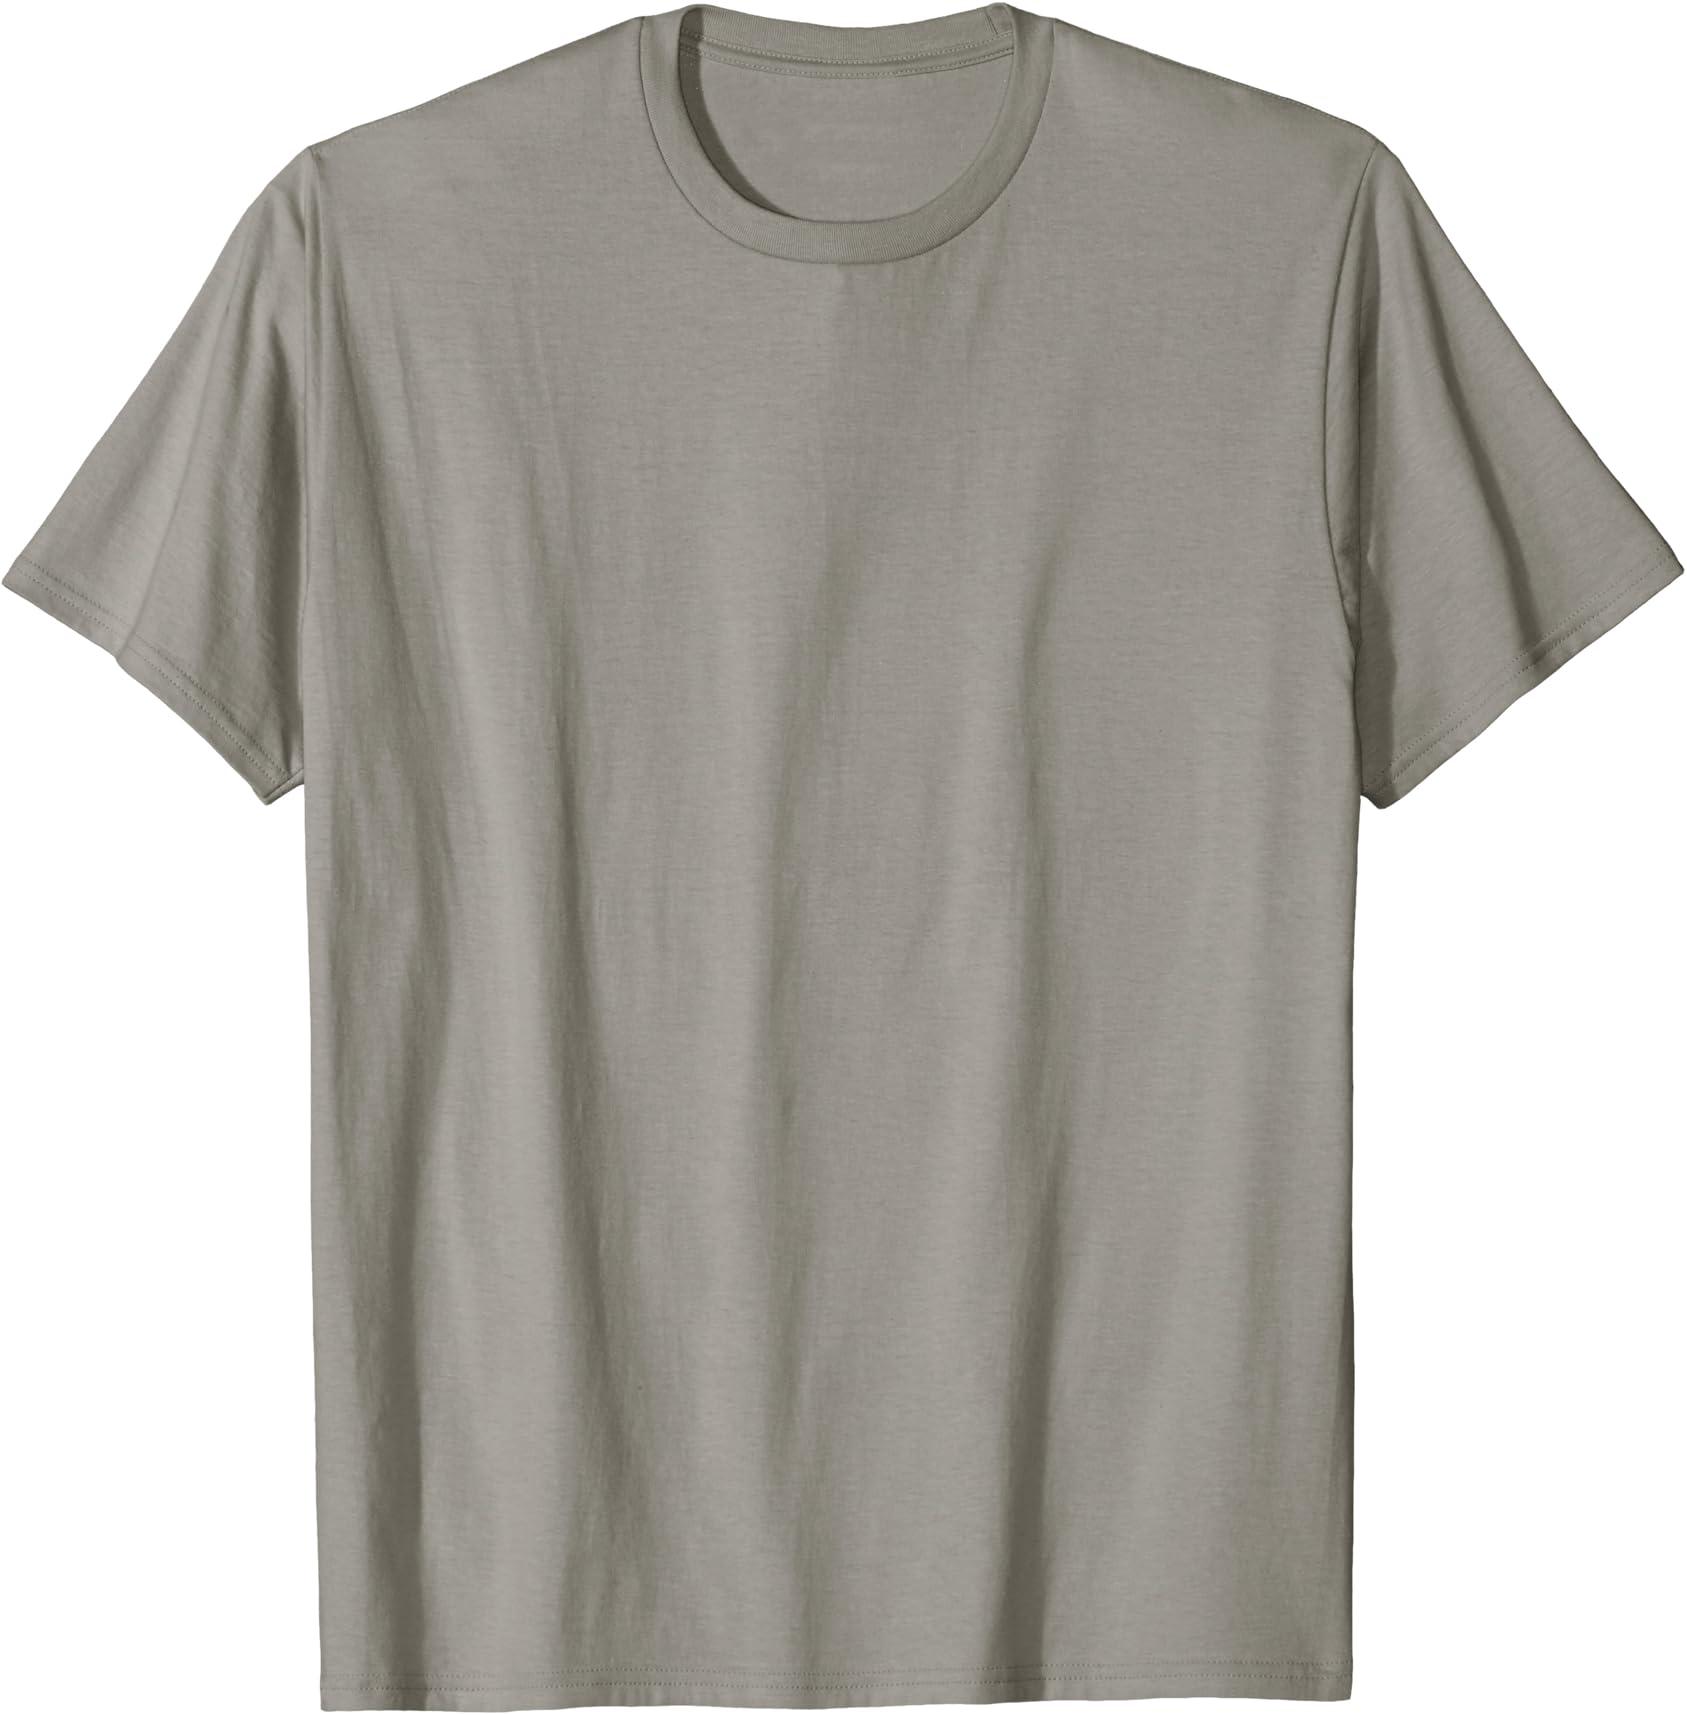 YILINGER 3D Printed T-Shirts Hello September Short Sleeve Tops Tees